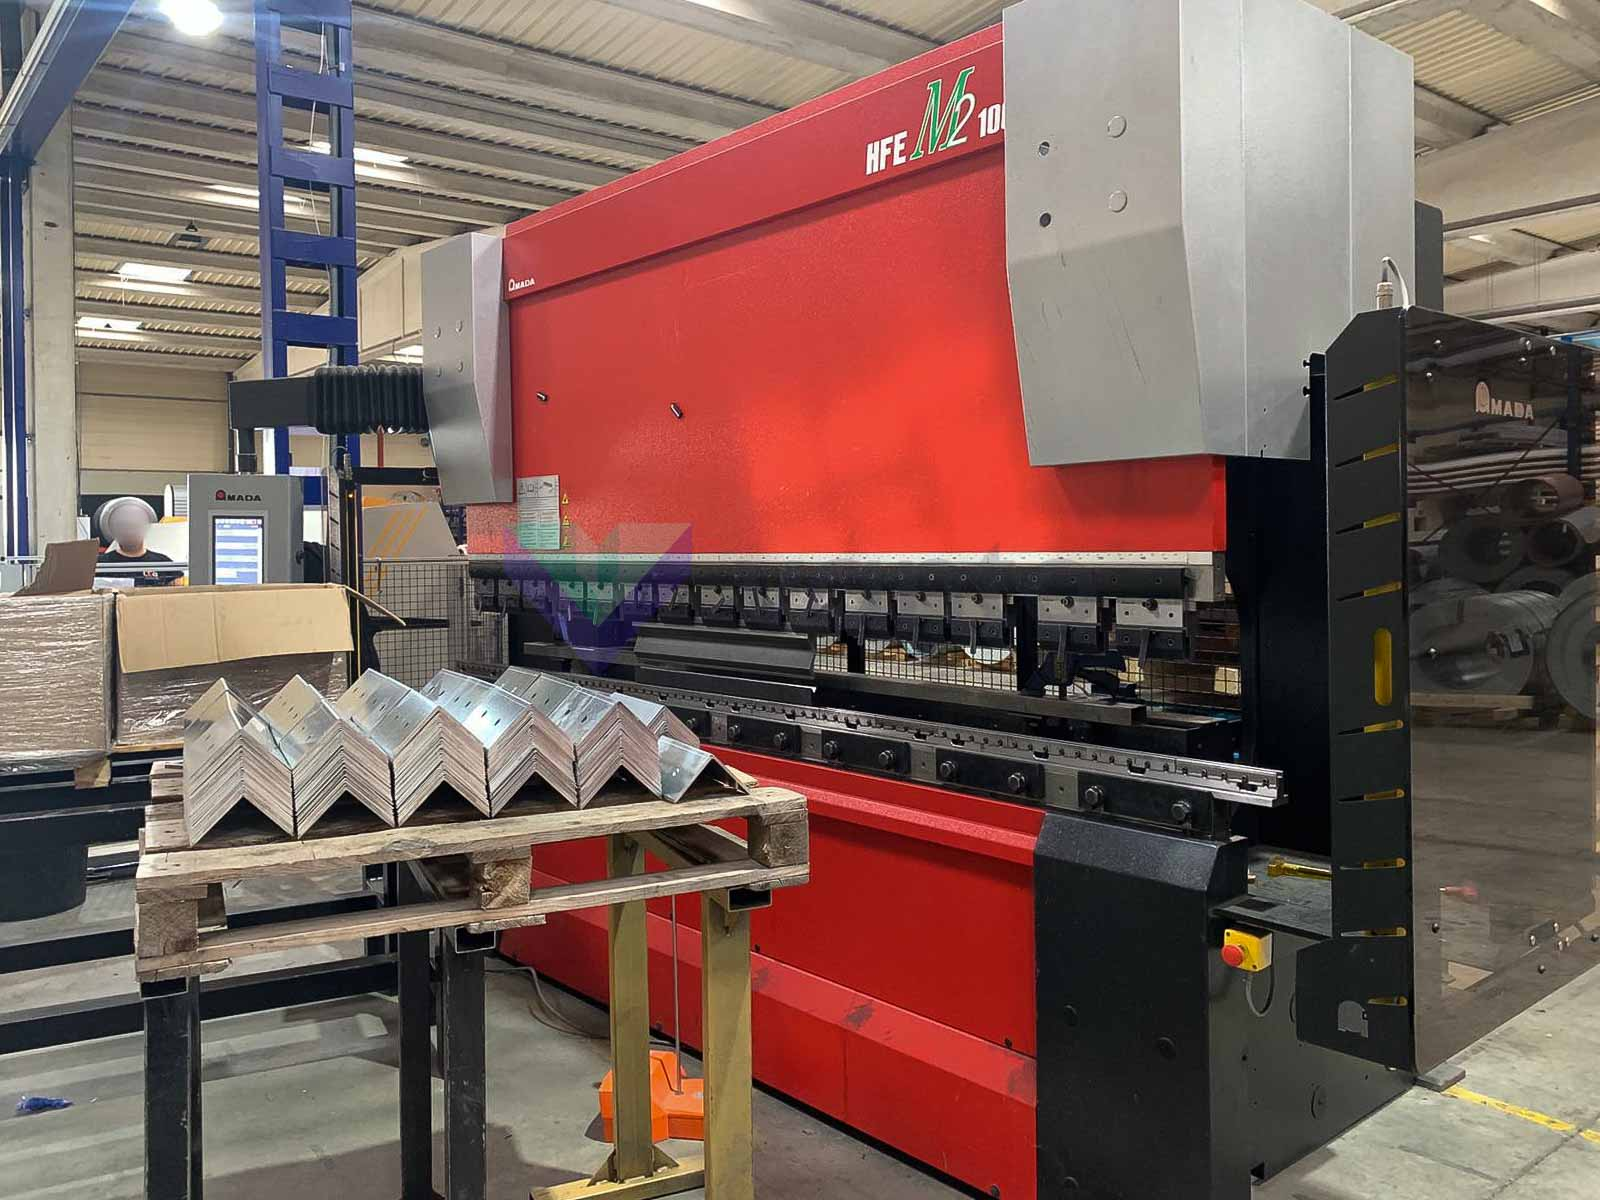 AMADA HFE M2 EVO 1003 CNC Bending machine (2017) id10384